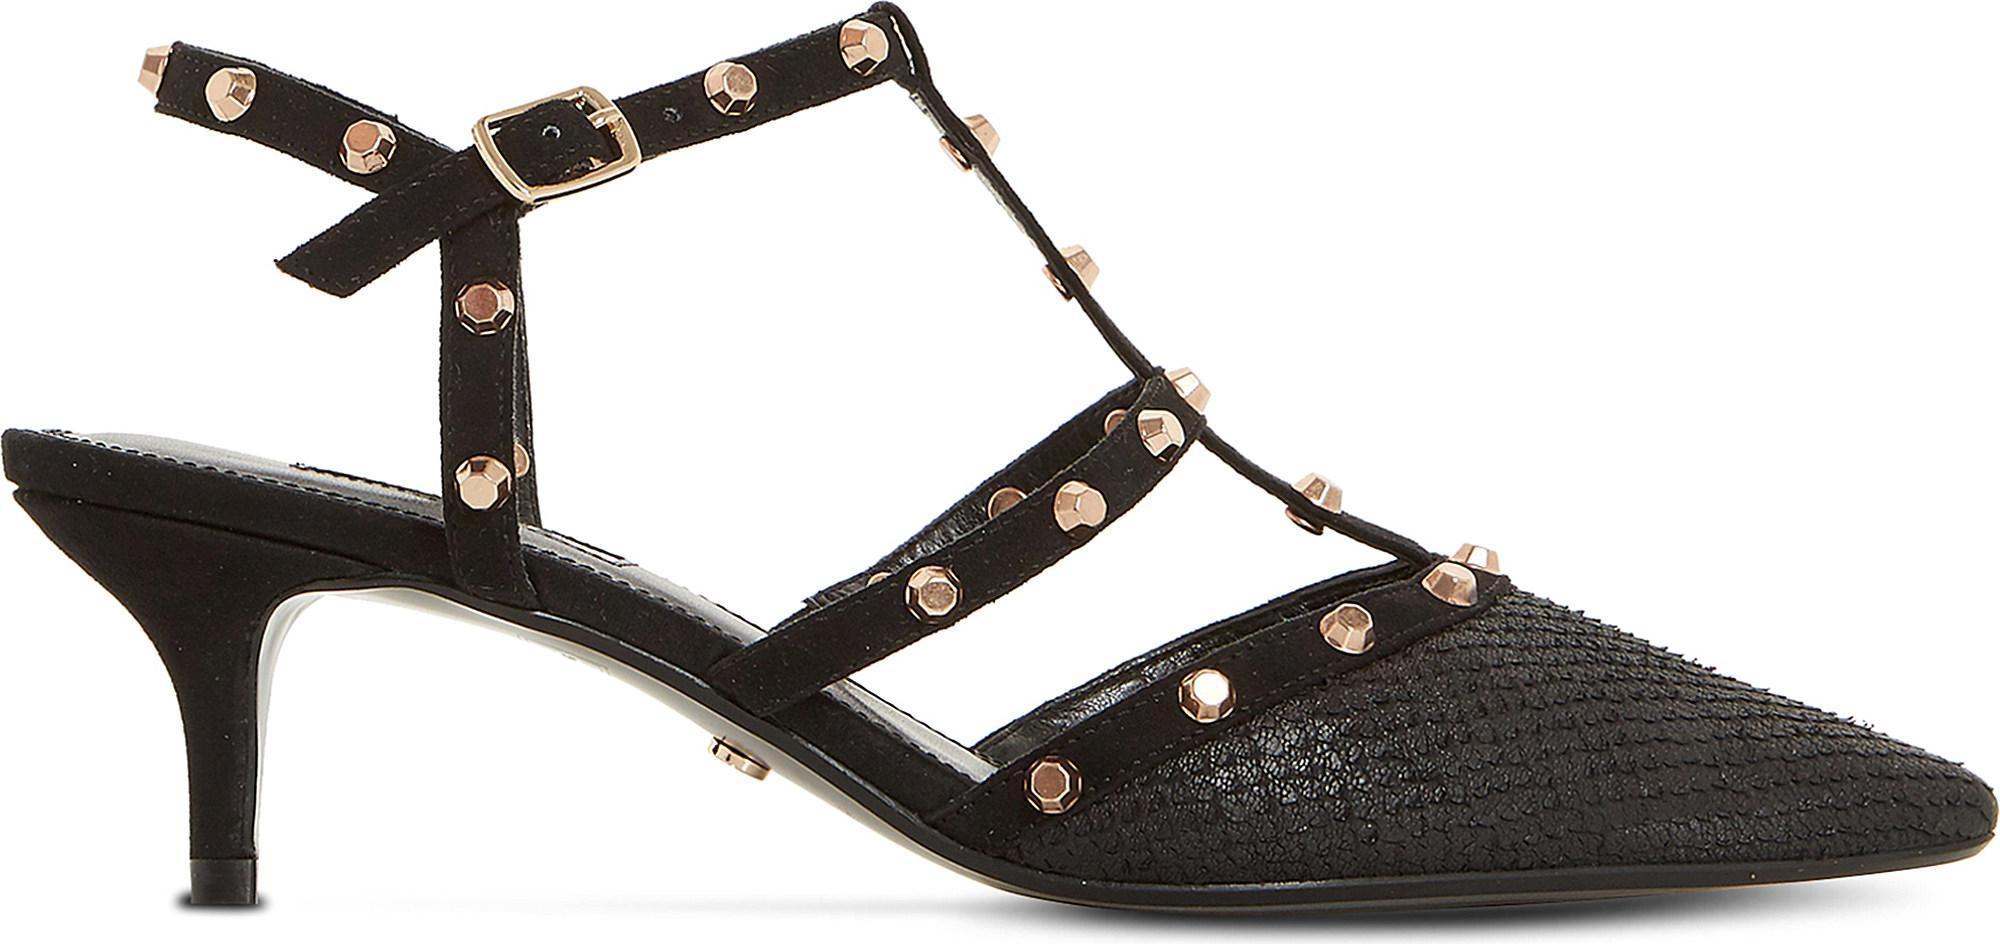 Casterly Studded-strap Kitten Heels